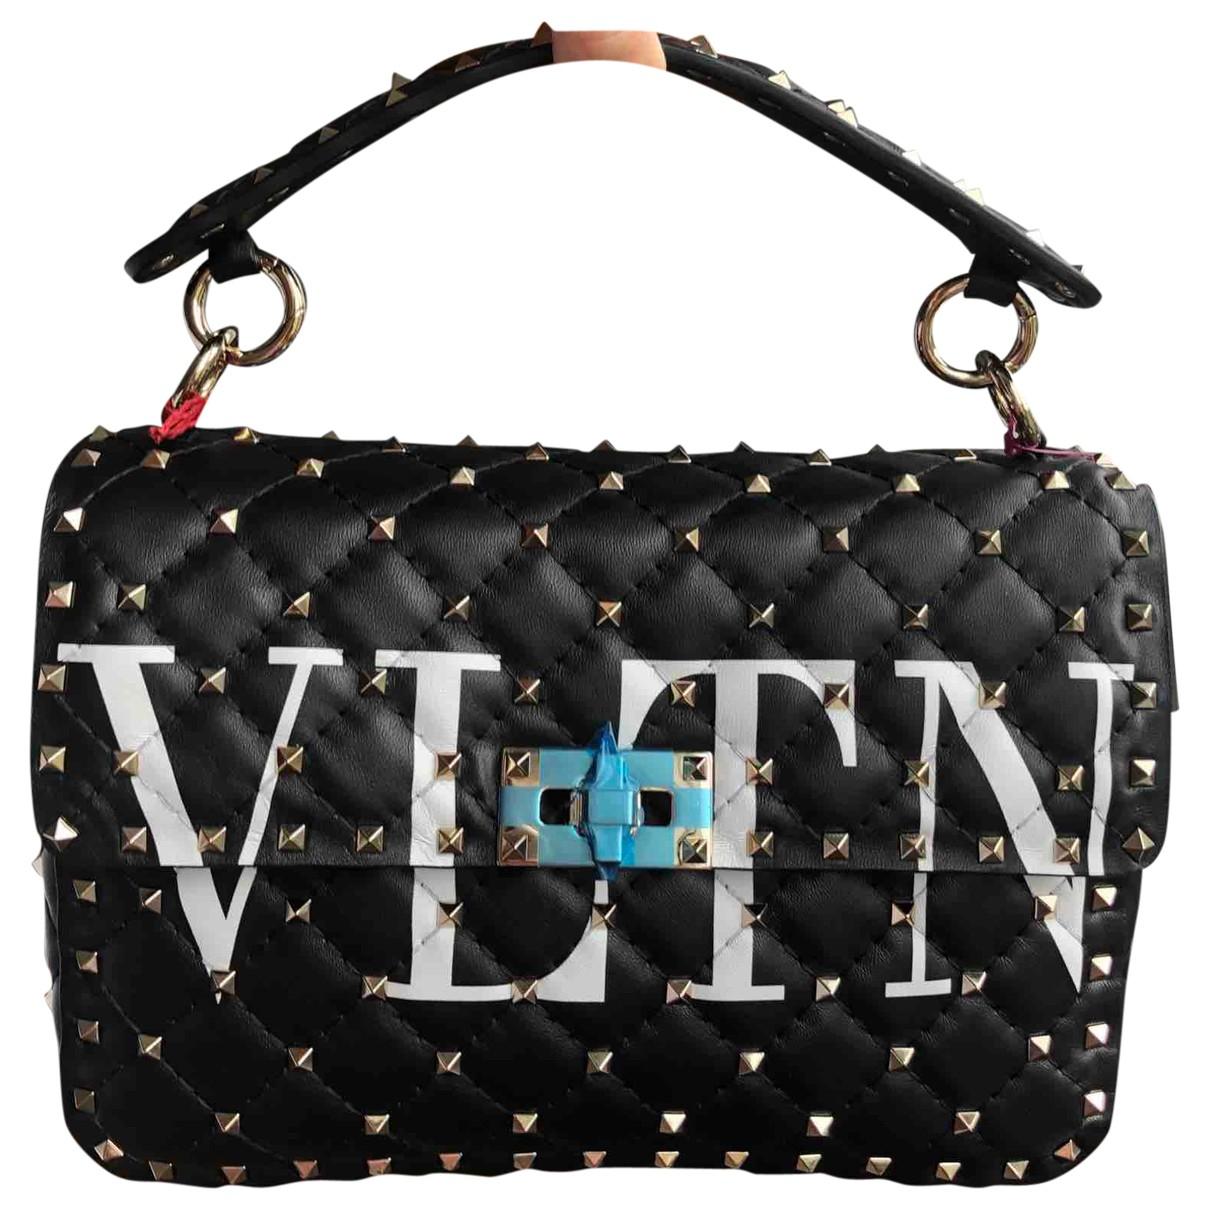 Valentino Garavani Rockstud spike Black Leather handbag for Women \N